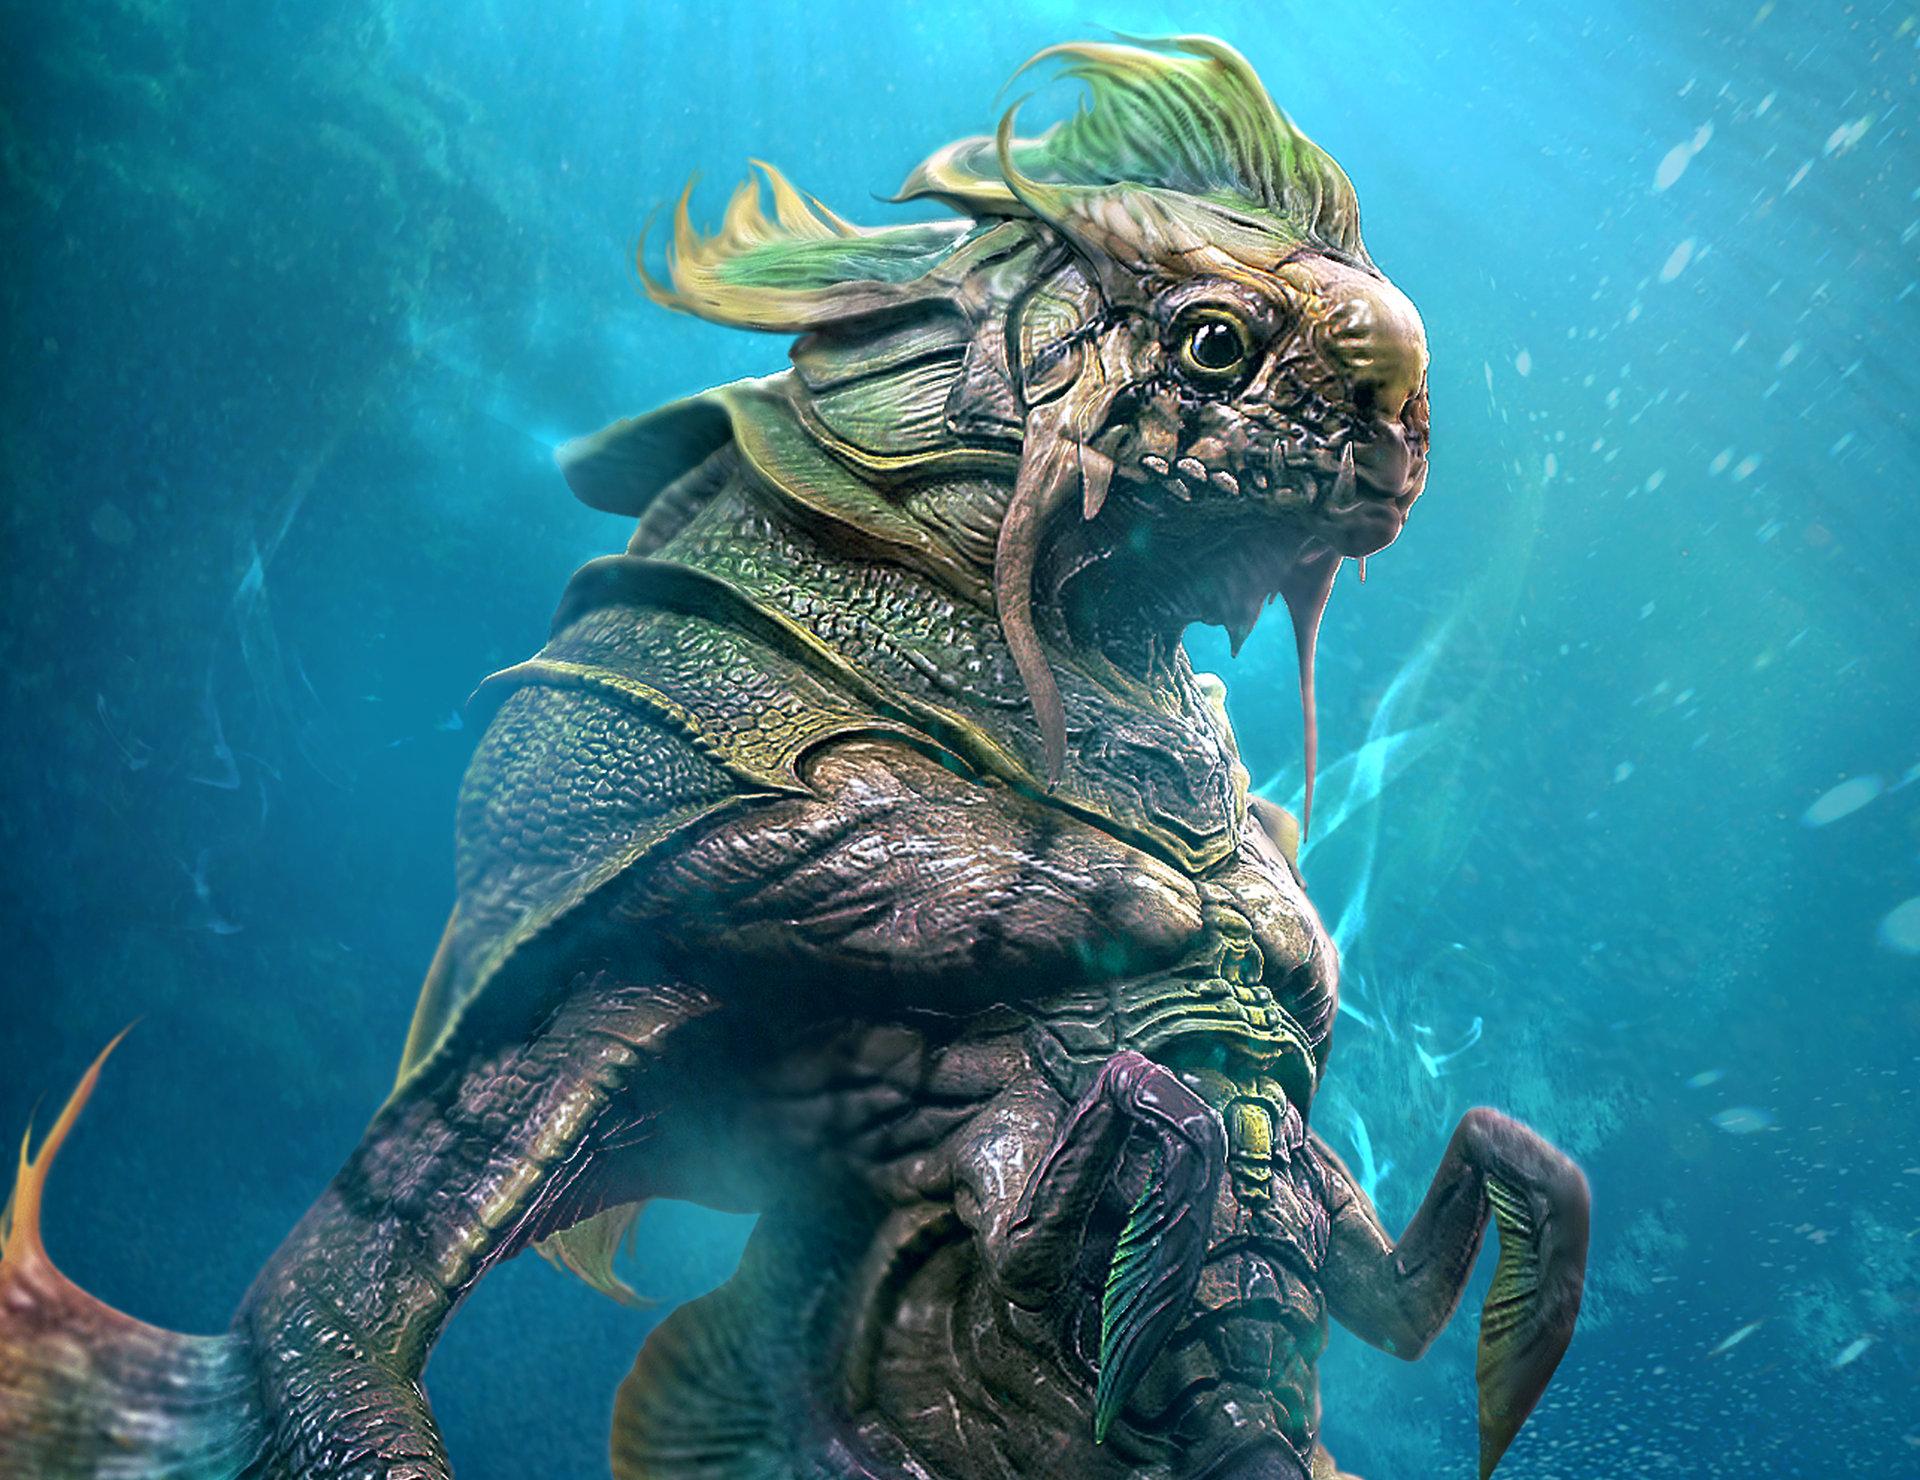 ArtStation - Sea Creature, Derrick Song